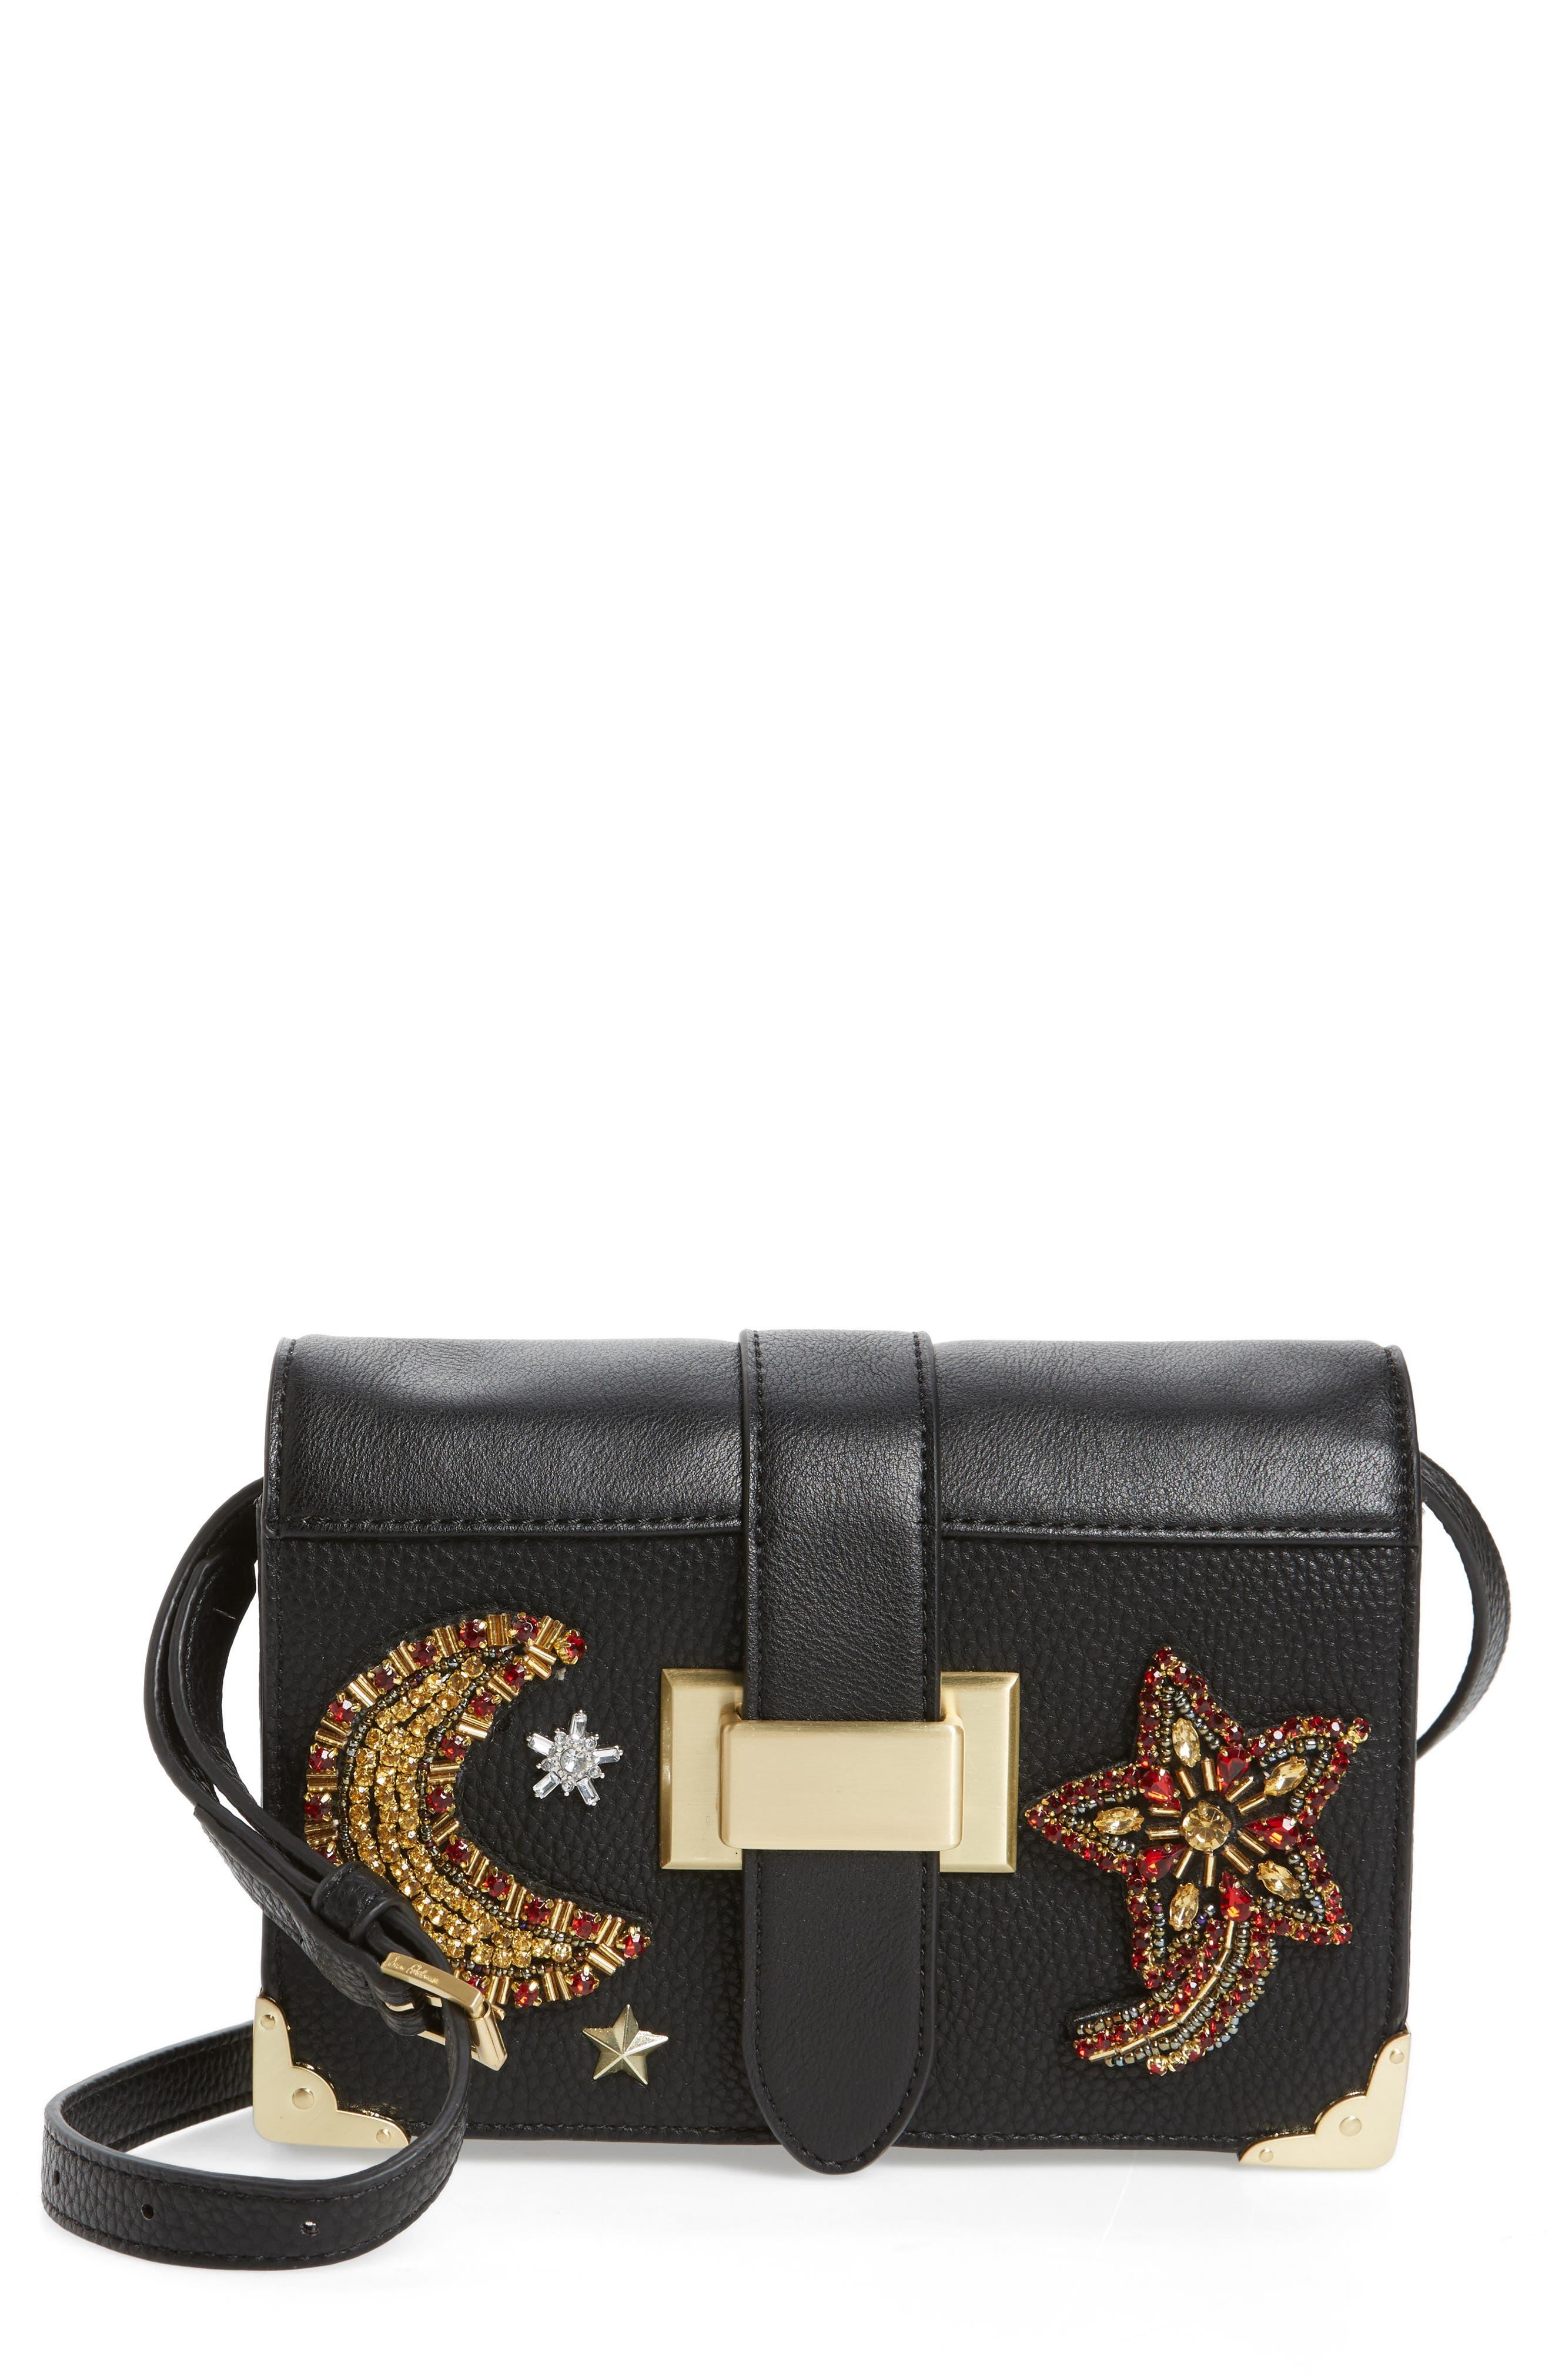 Sam Edelman Florence Faux Leather Clutch Wallet